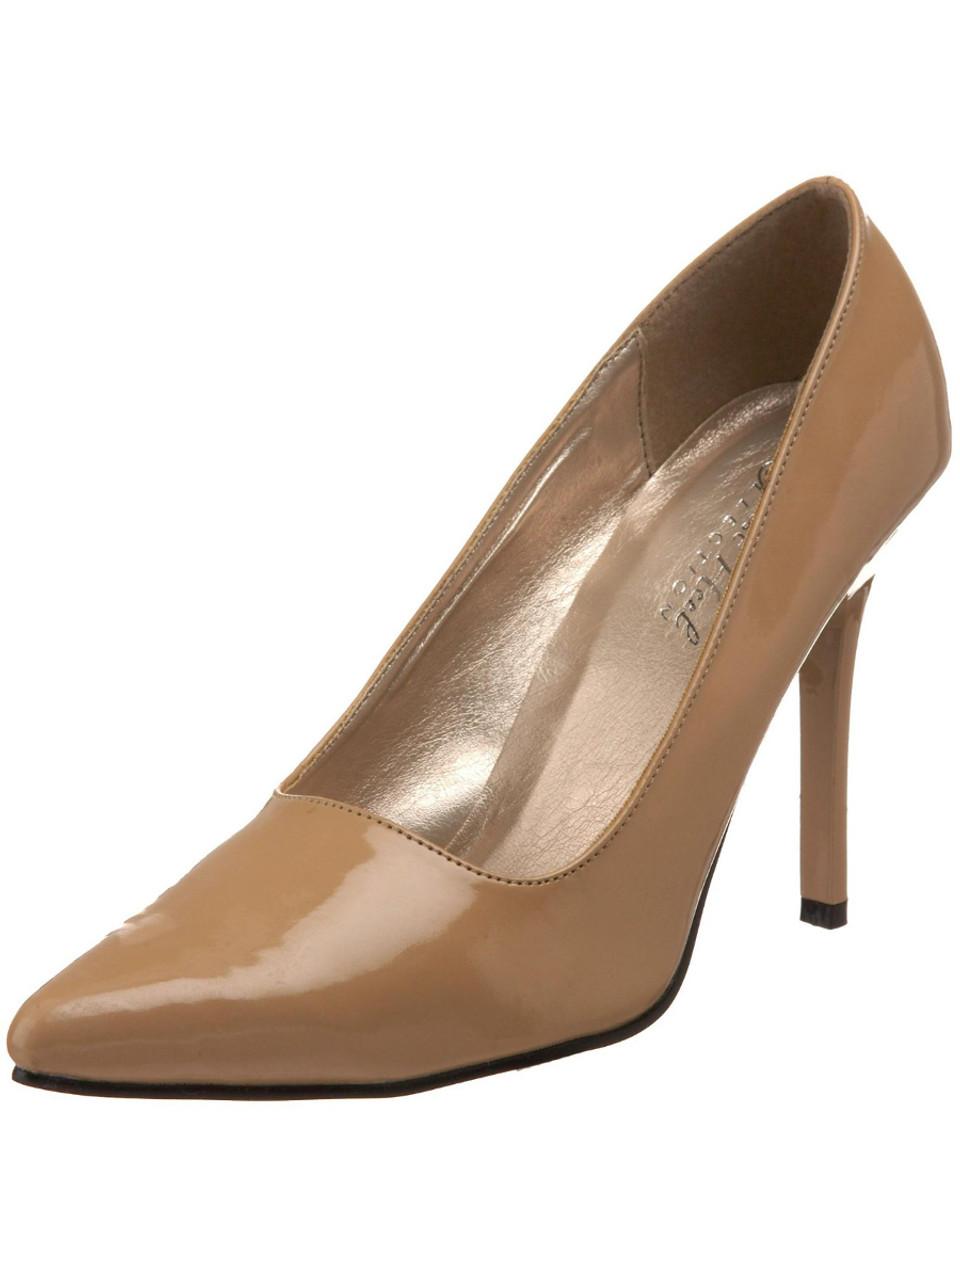 73b4bbe33f2 The Highest Heel CLASSIC Women's Sexy 4